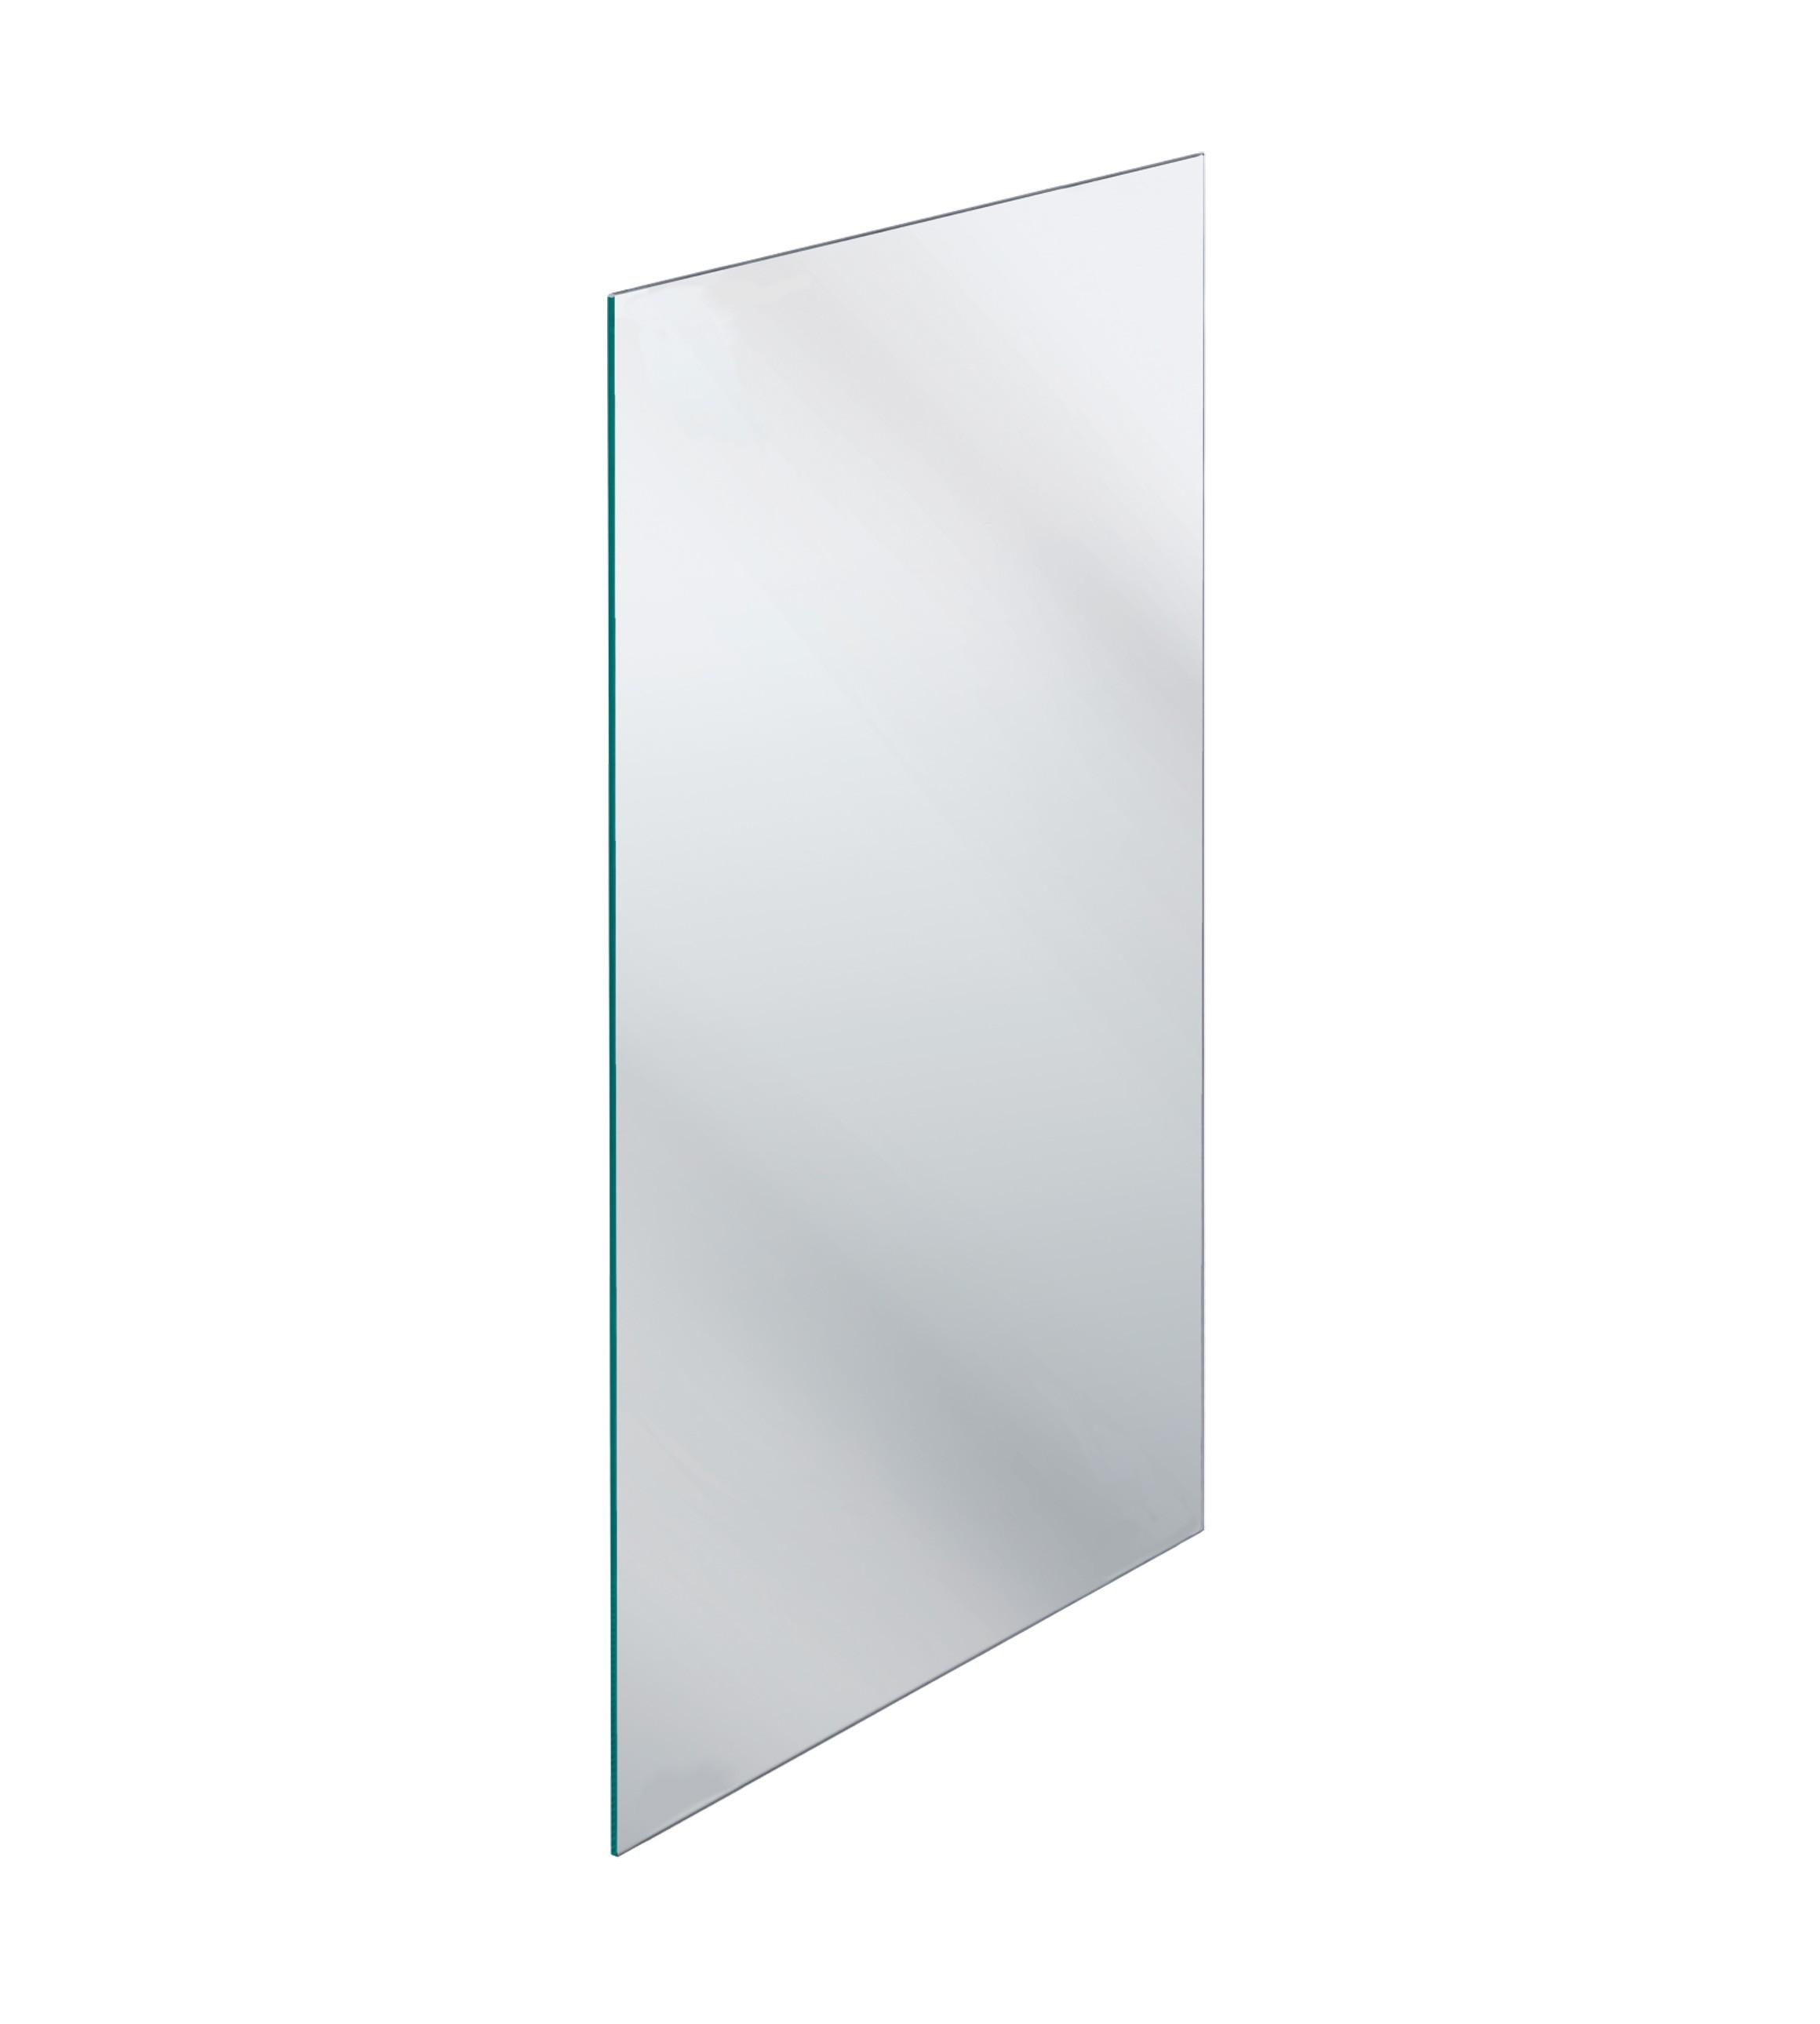 FSB Spiegel 450x450 Edelstahl spiegelpolinksert (0 82 8260 00054 6205)